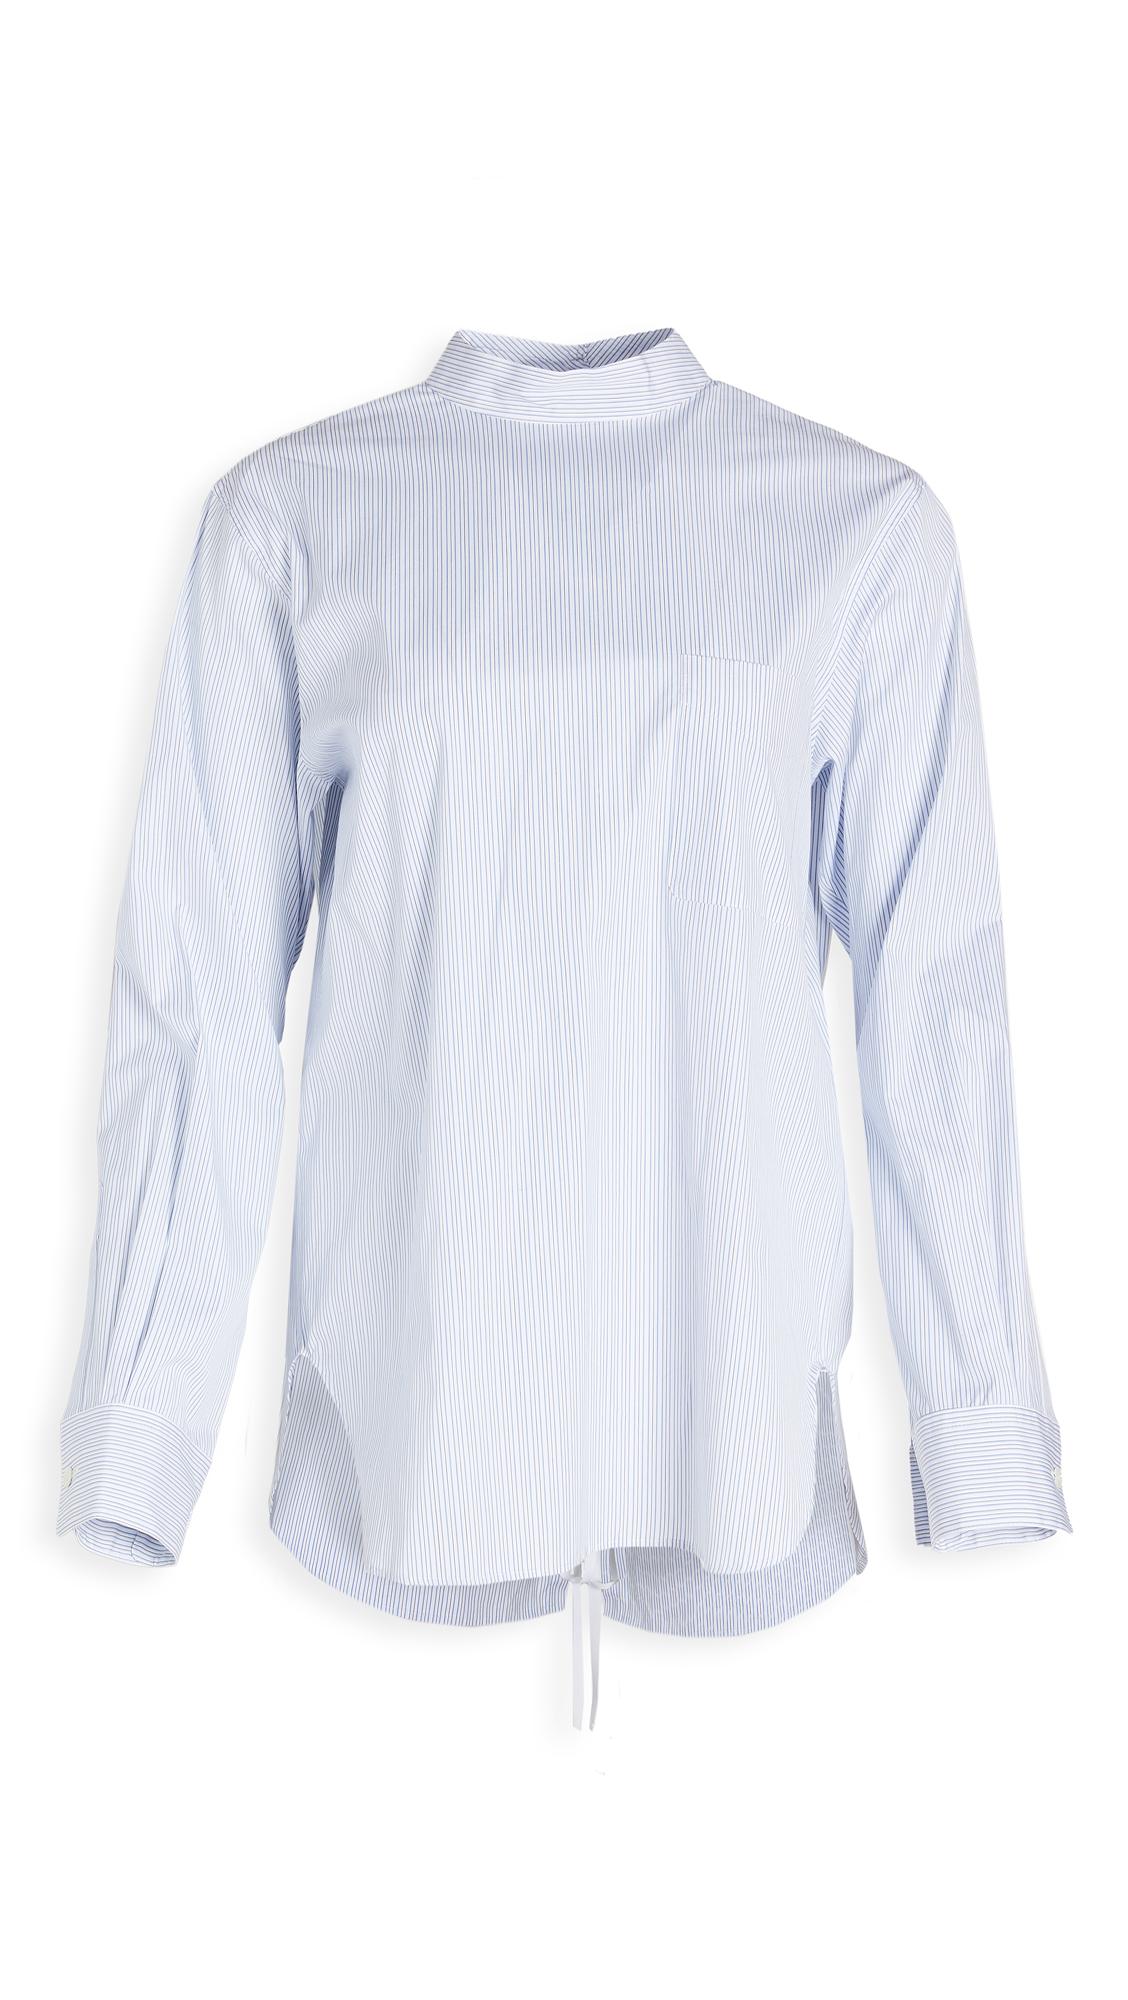 Toga Pulla Cotton Pullover Shirt - 30% Off Sale